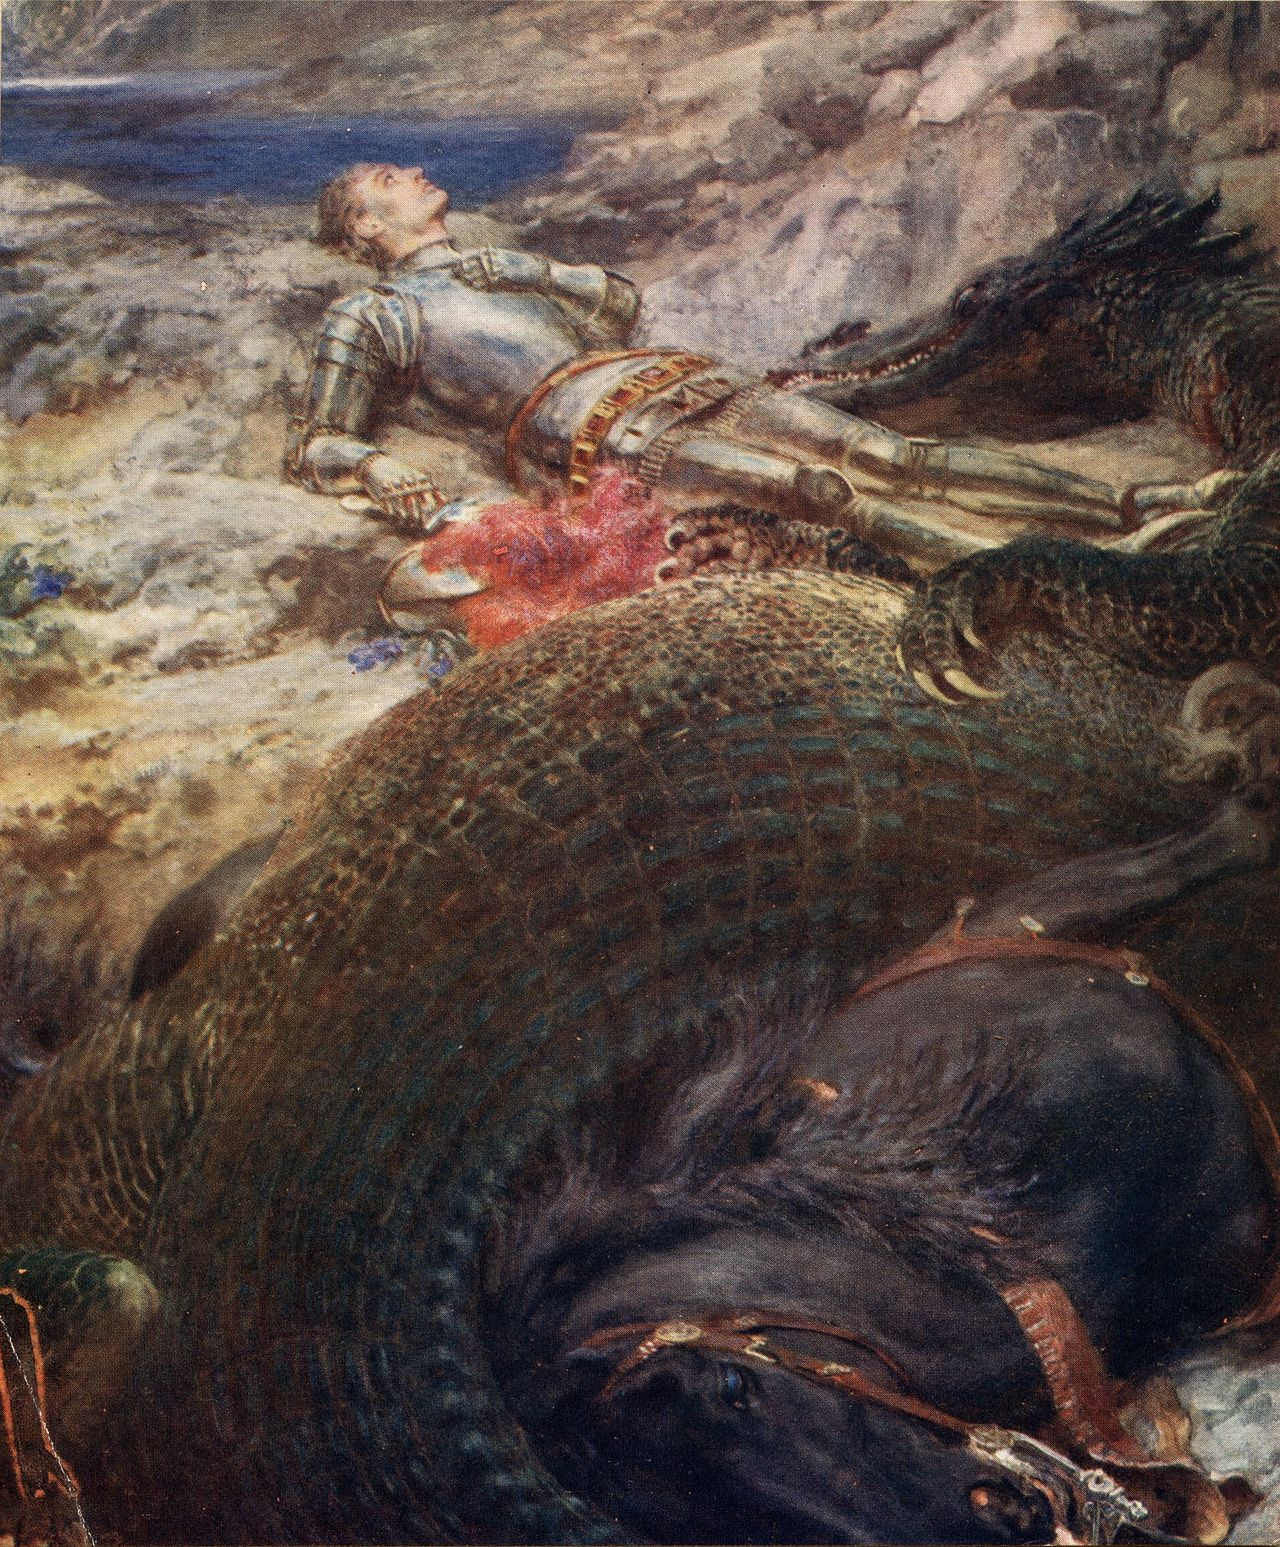 St._George_and_the_Dragon-Briton_Riviere